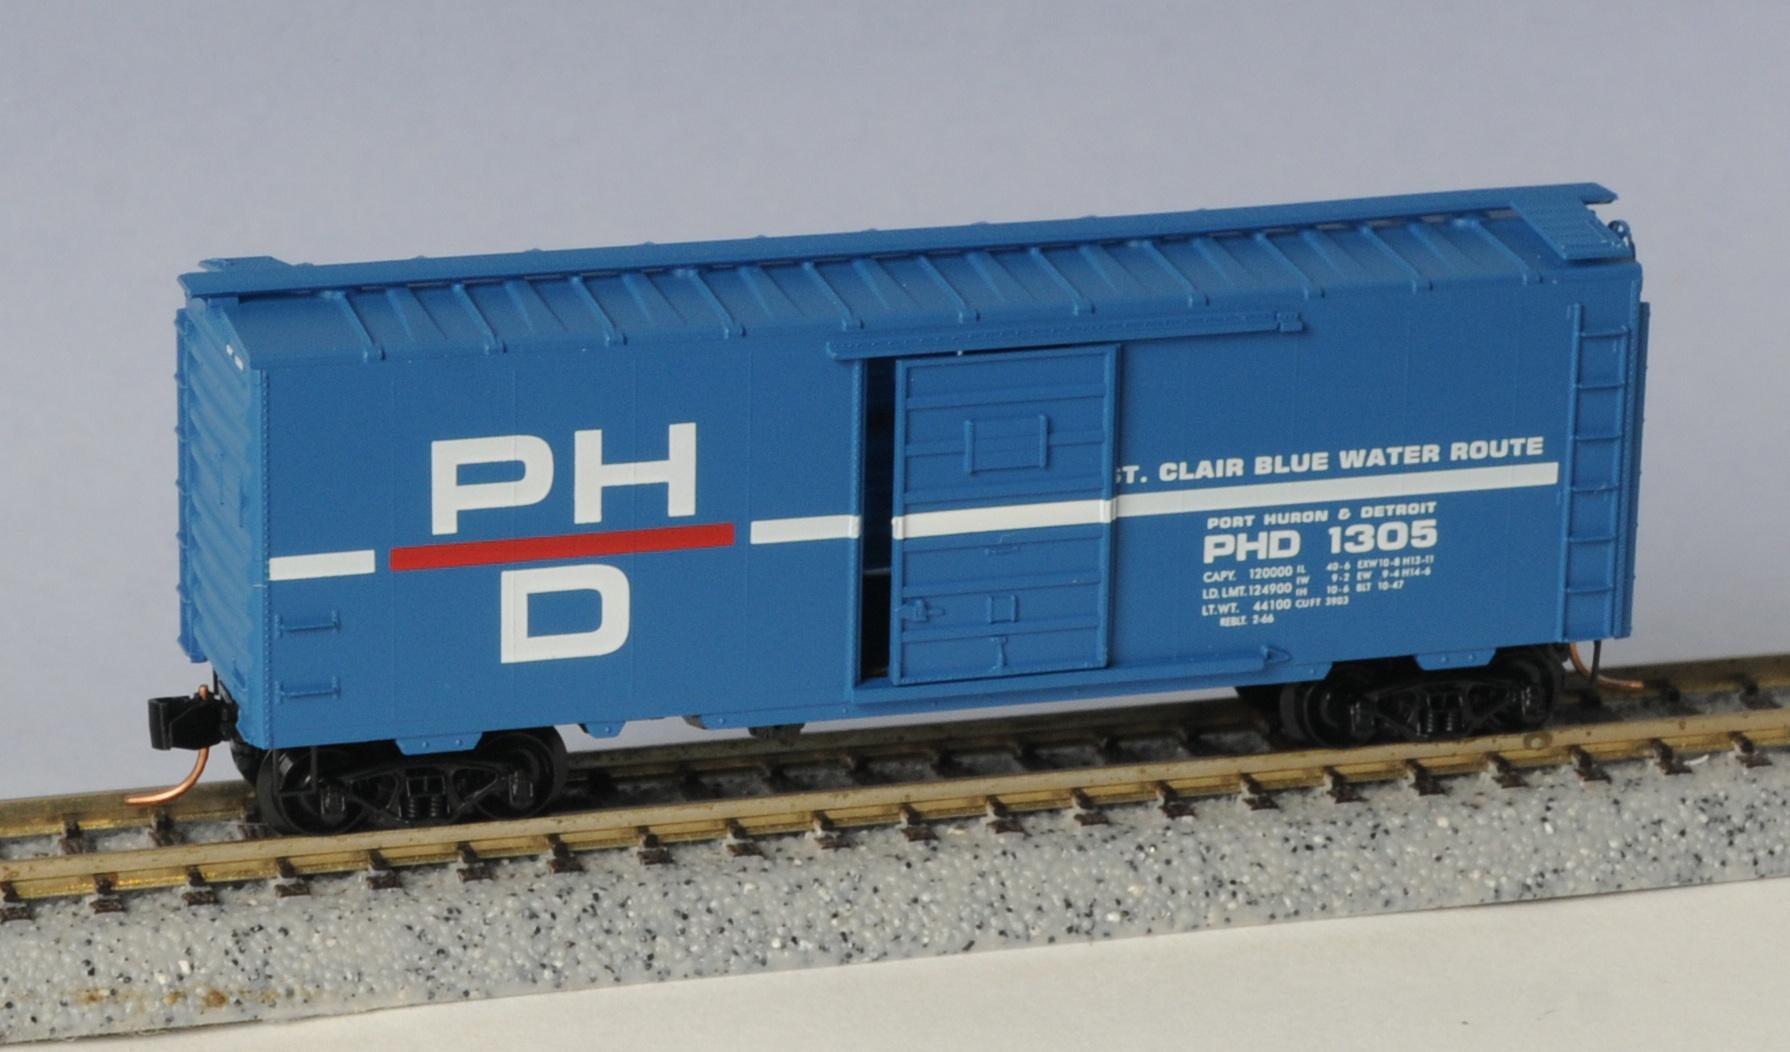 N Scale - Micro-Trains - 20150 - Boxcar, 40 Foot, PS-1 - Port Huron & Detroit - 1305